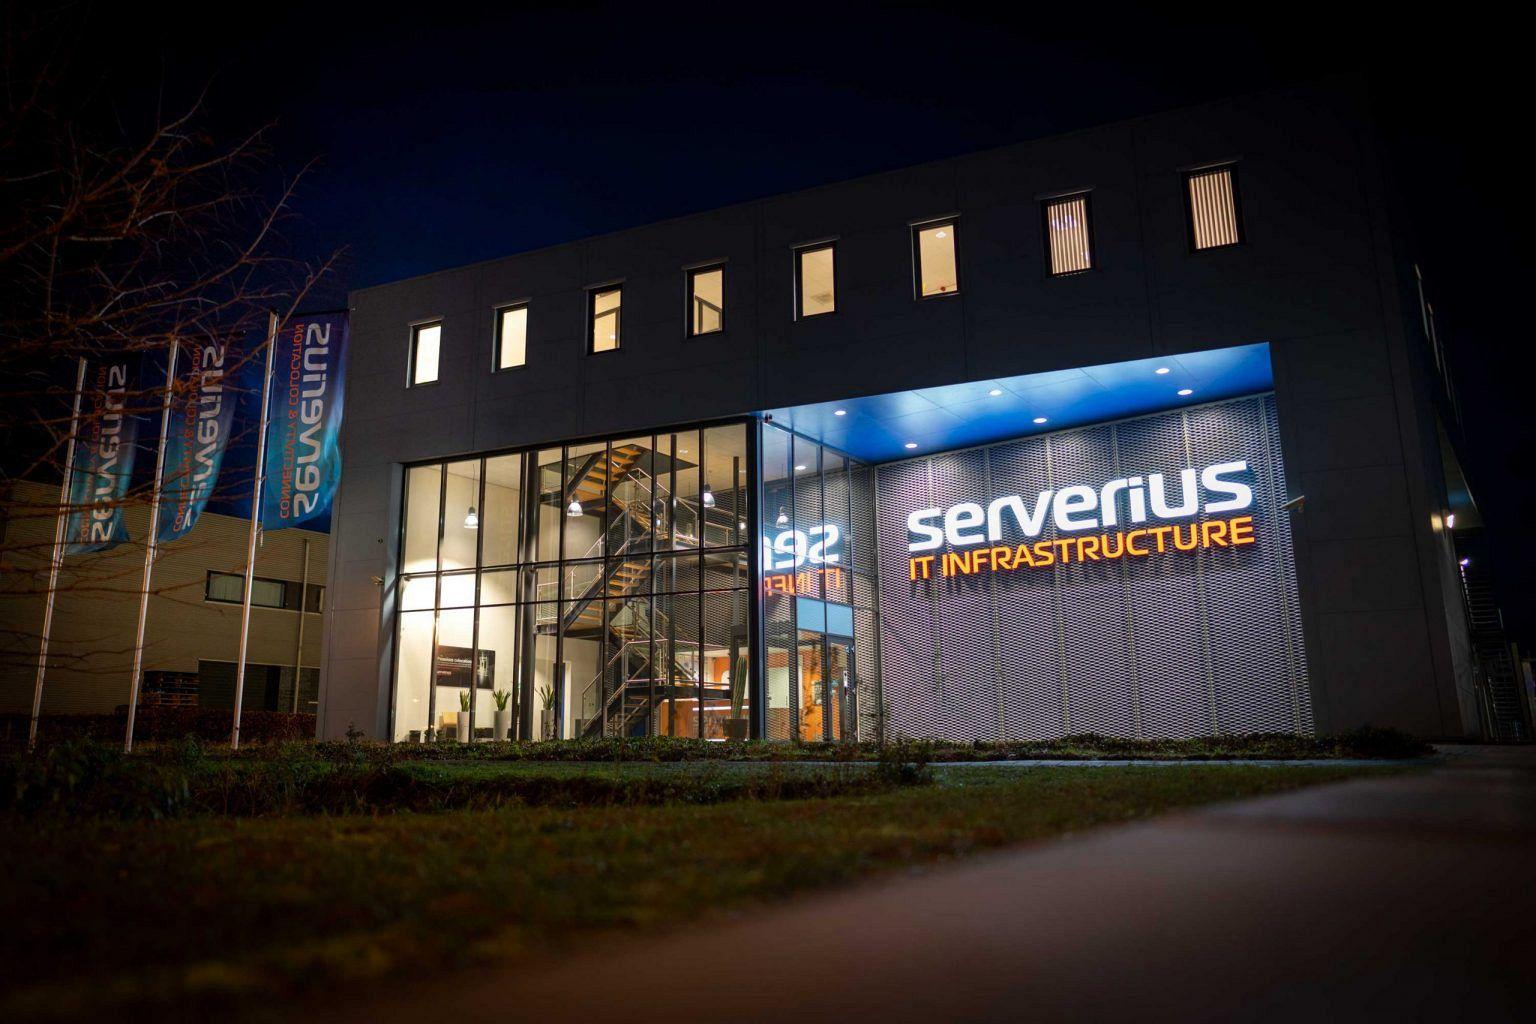 Serverius